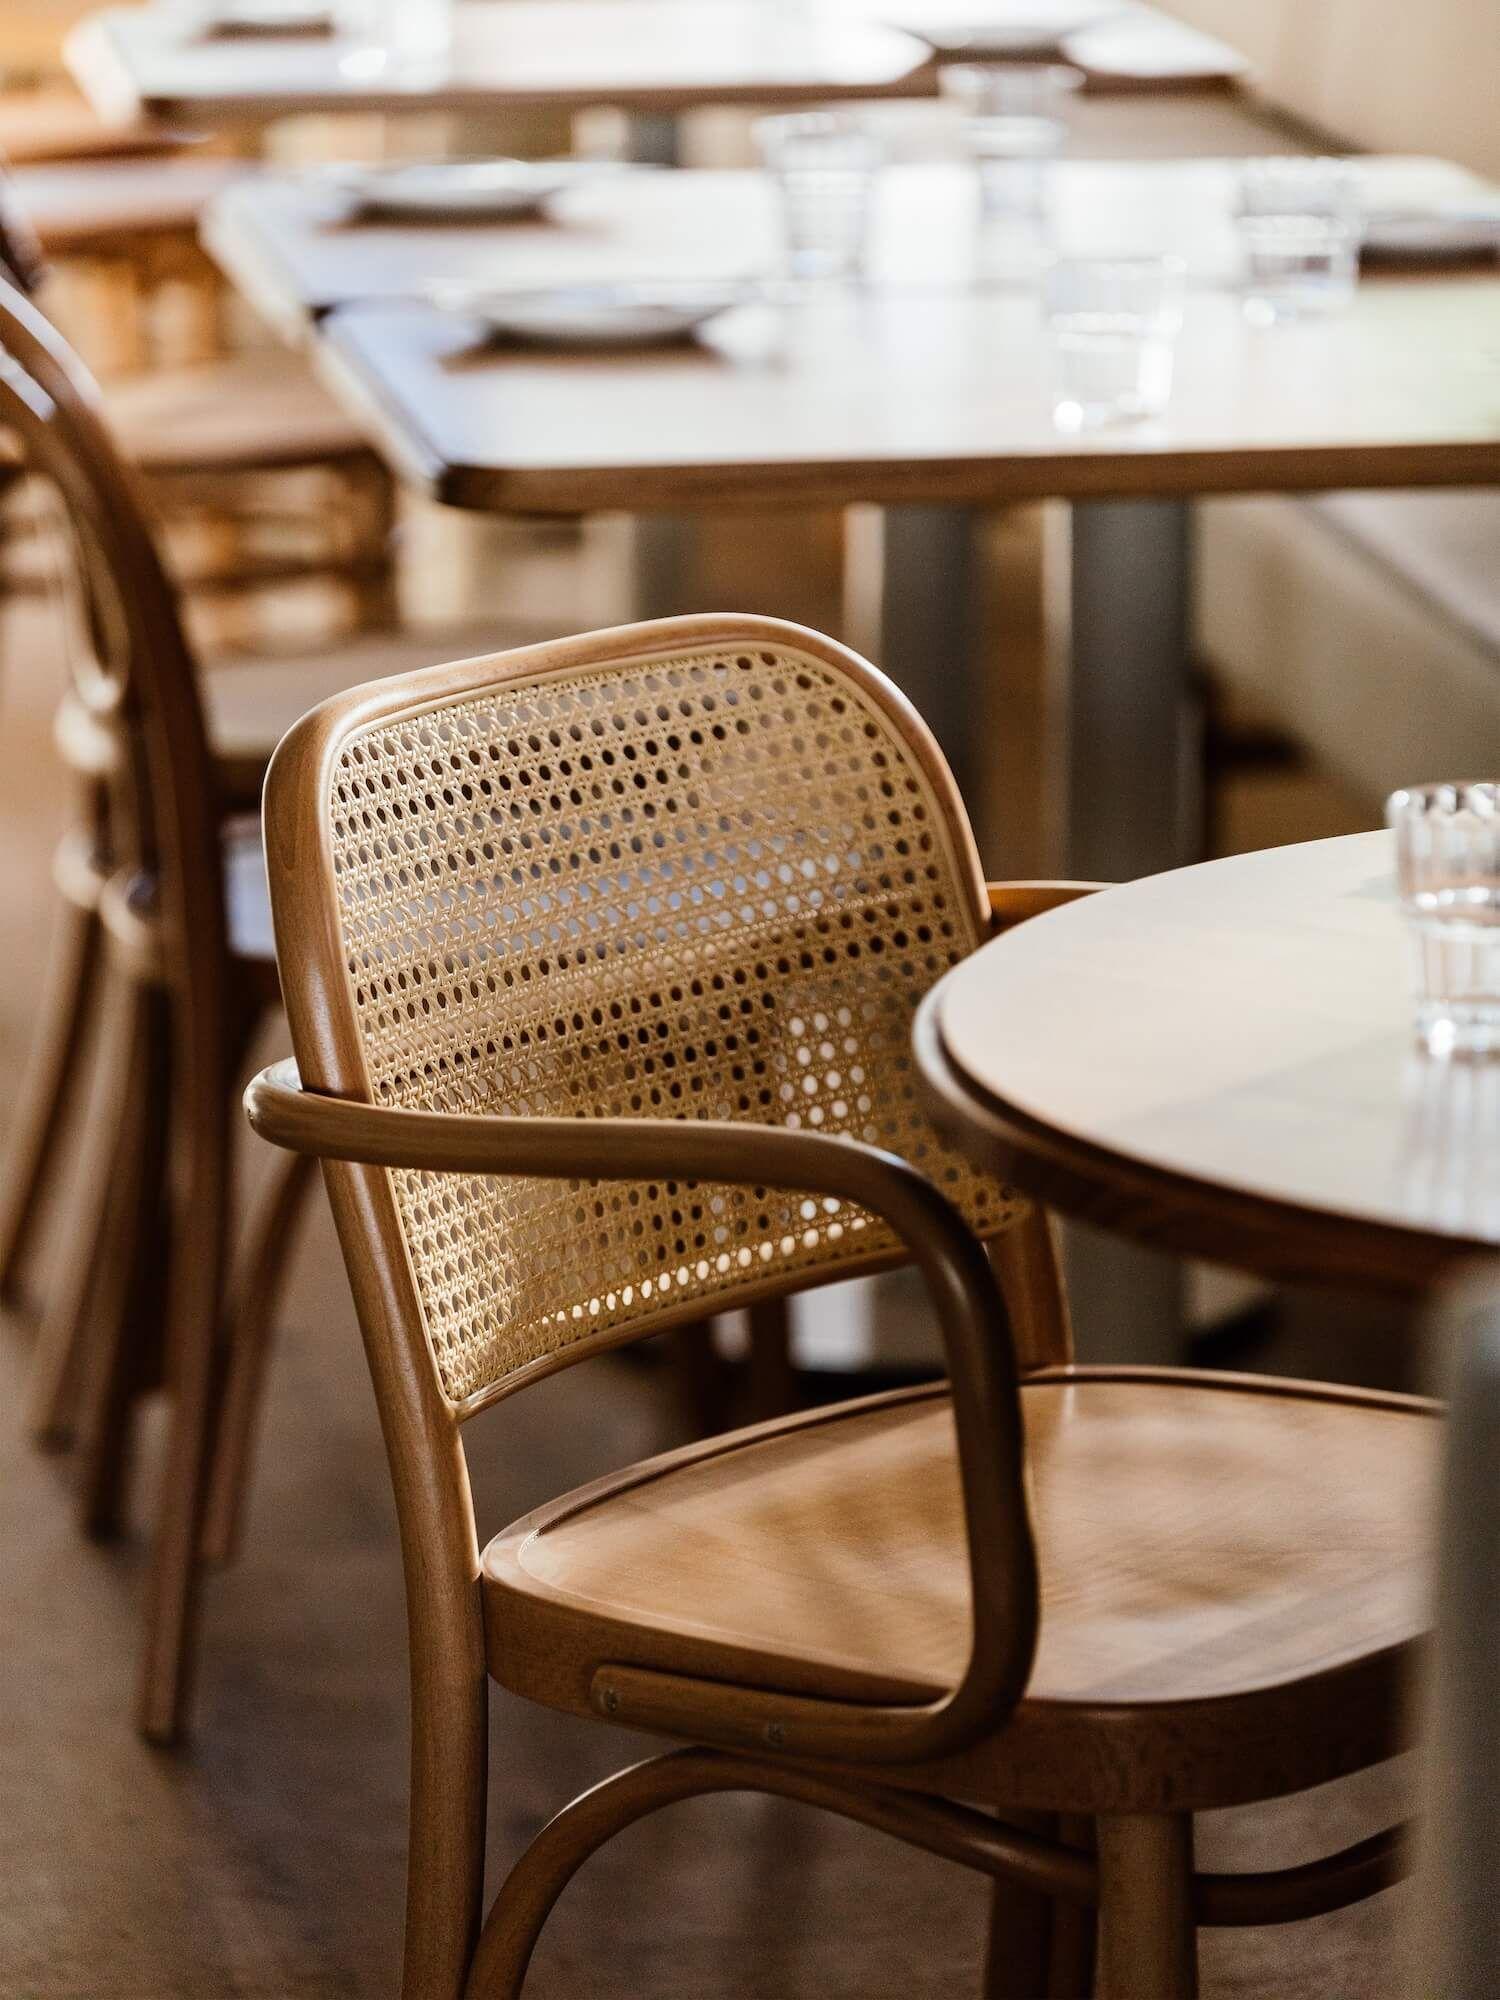 Sisterhood Restaurant by Biasol | Australian Hospitality Design | est living